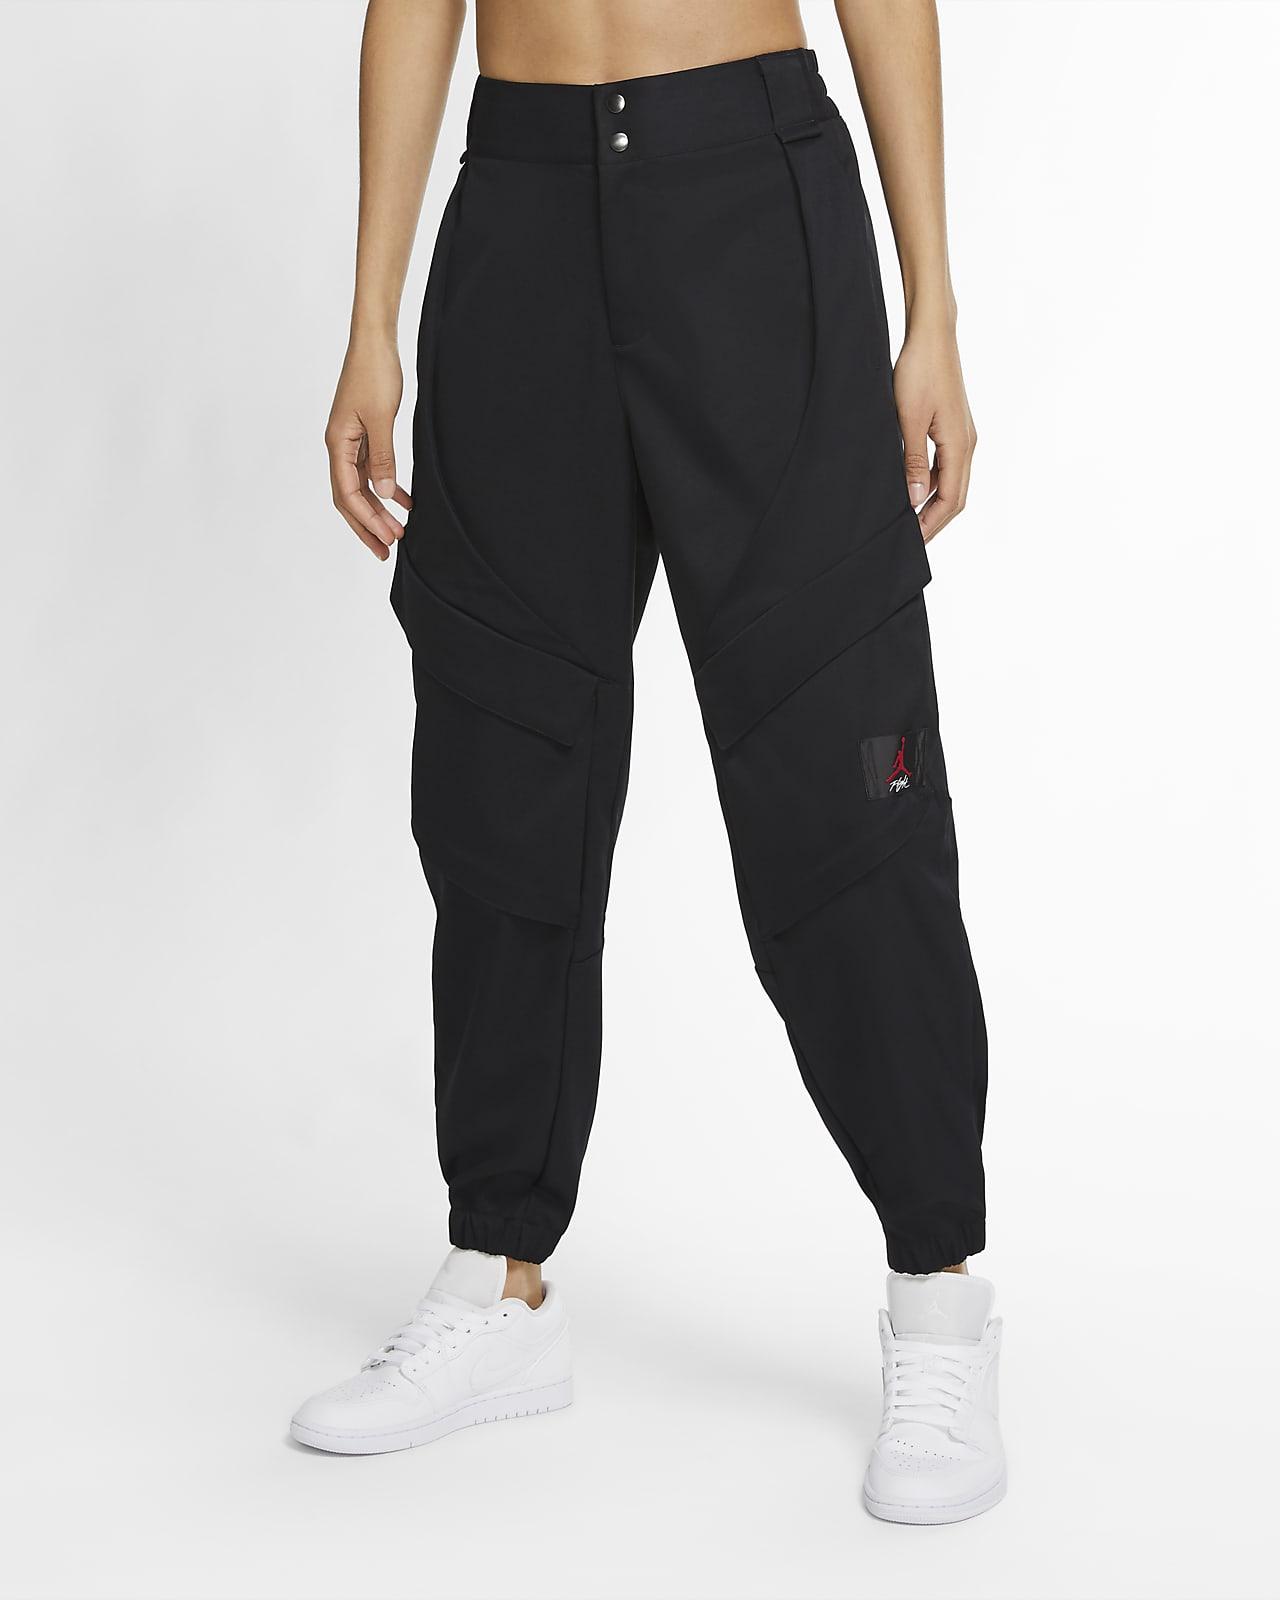 Jordan Essentials Women's Utility Pants